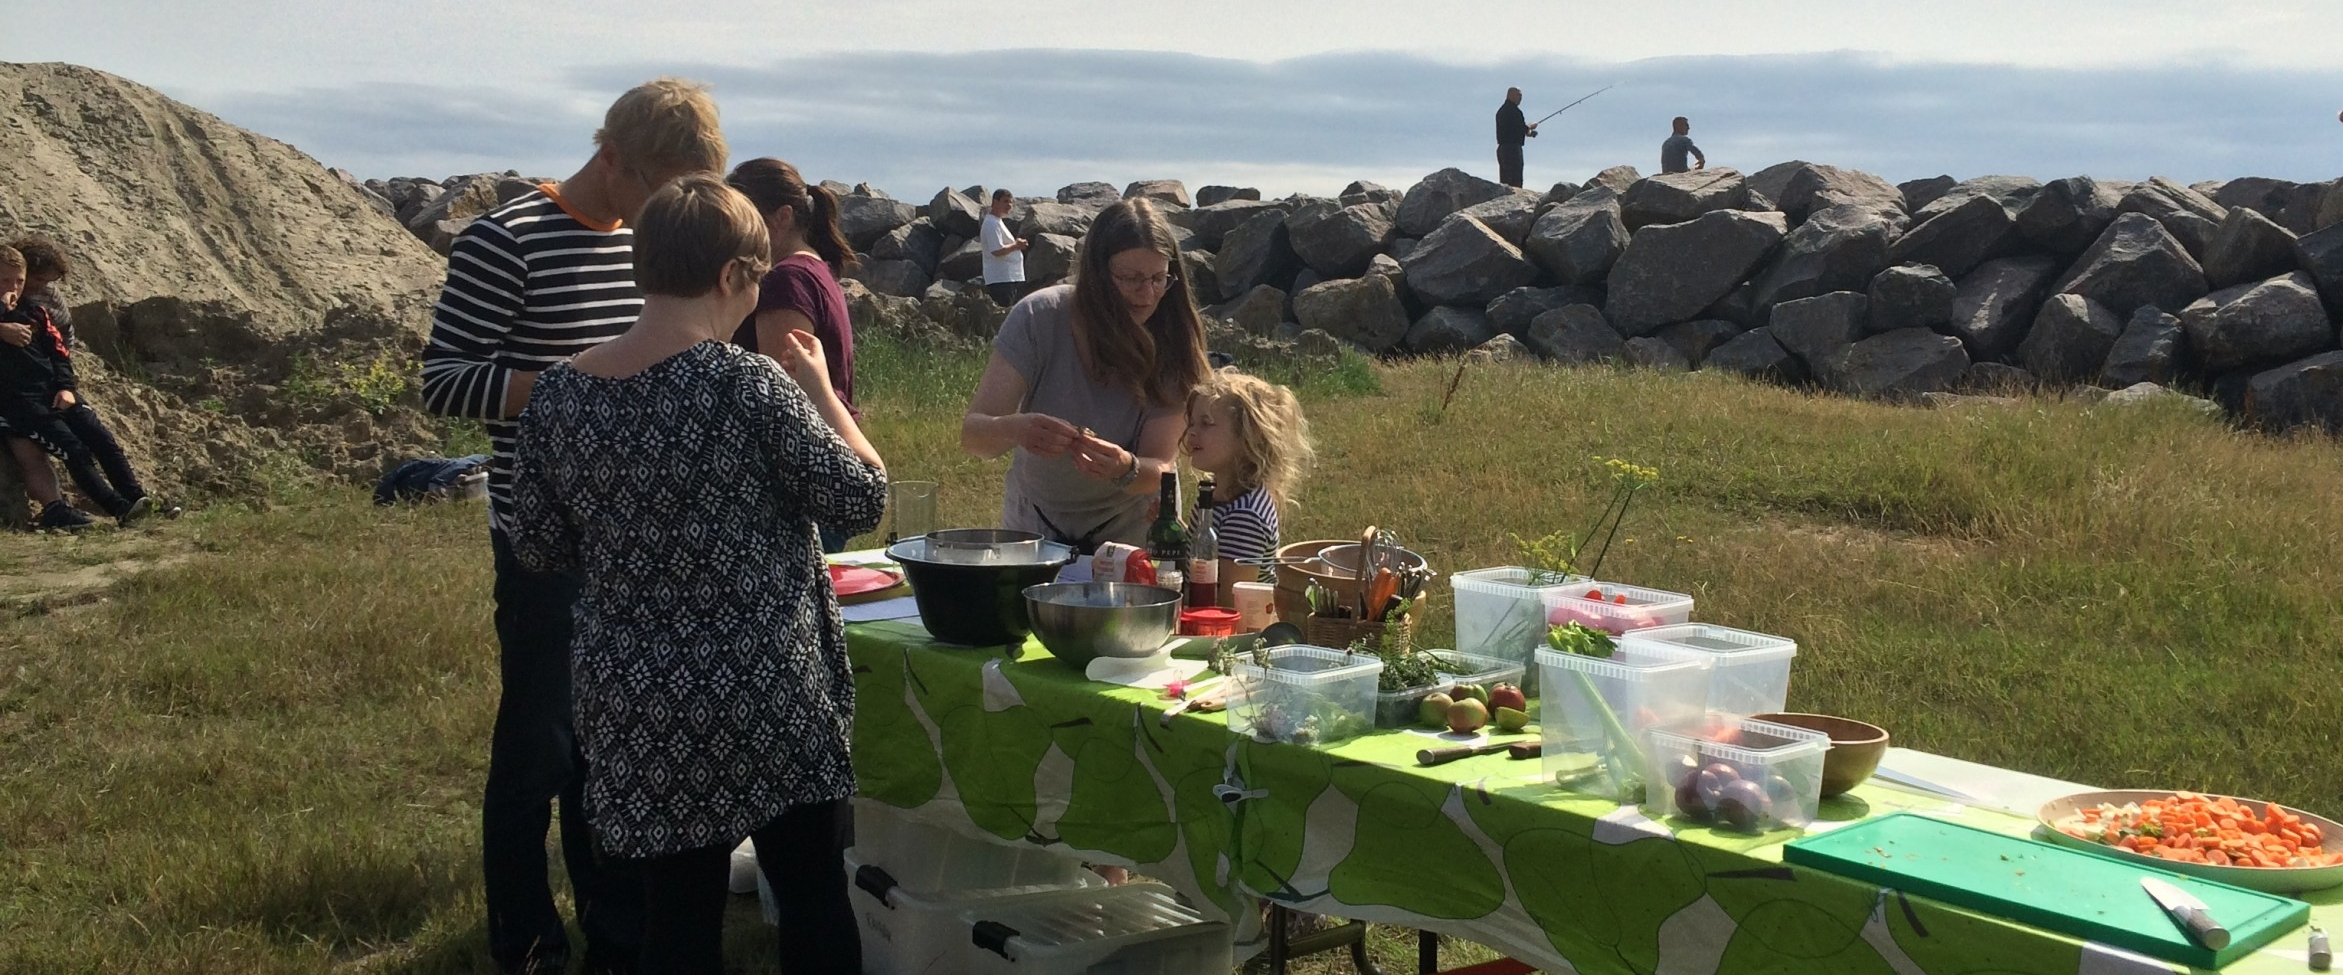 køkken på stranden